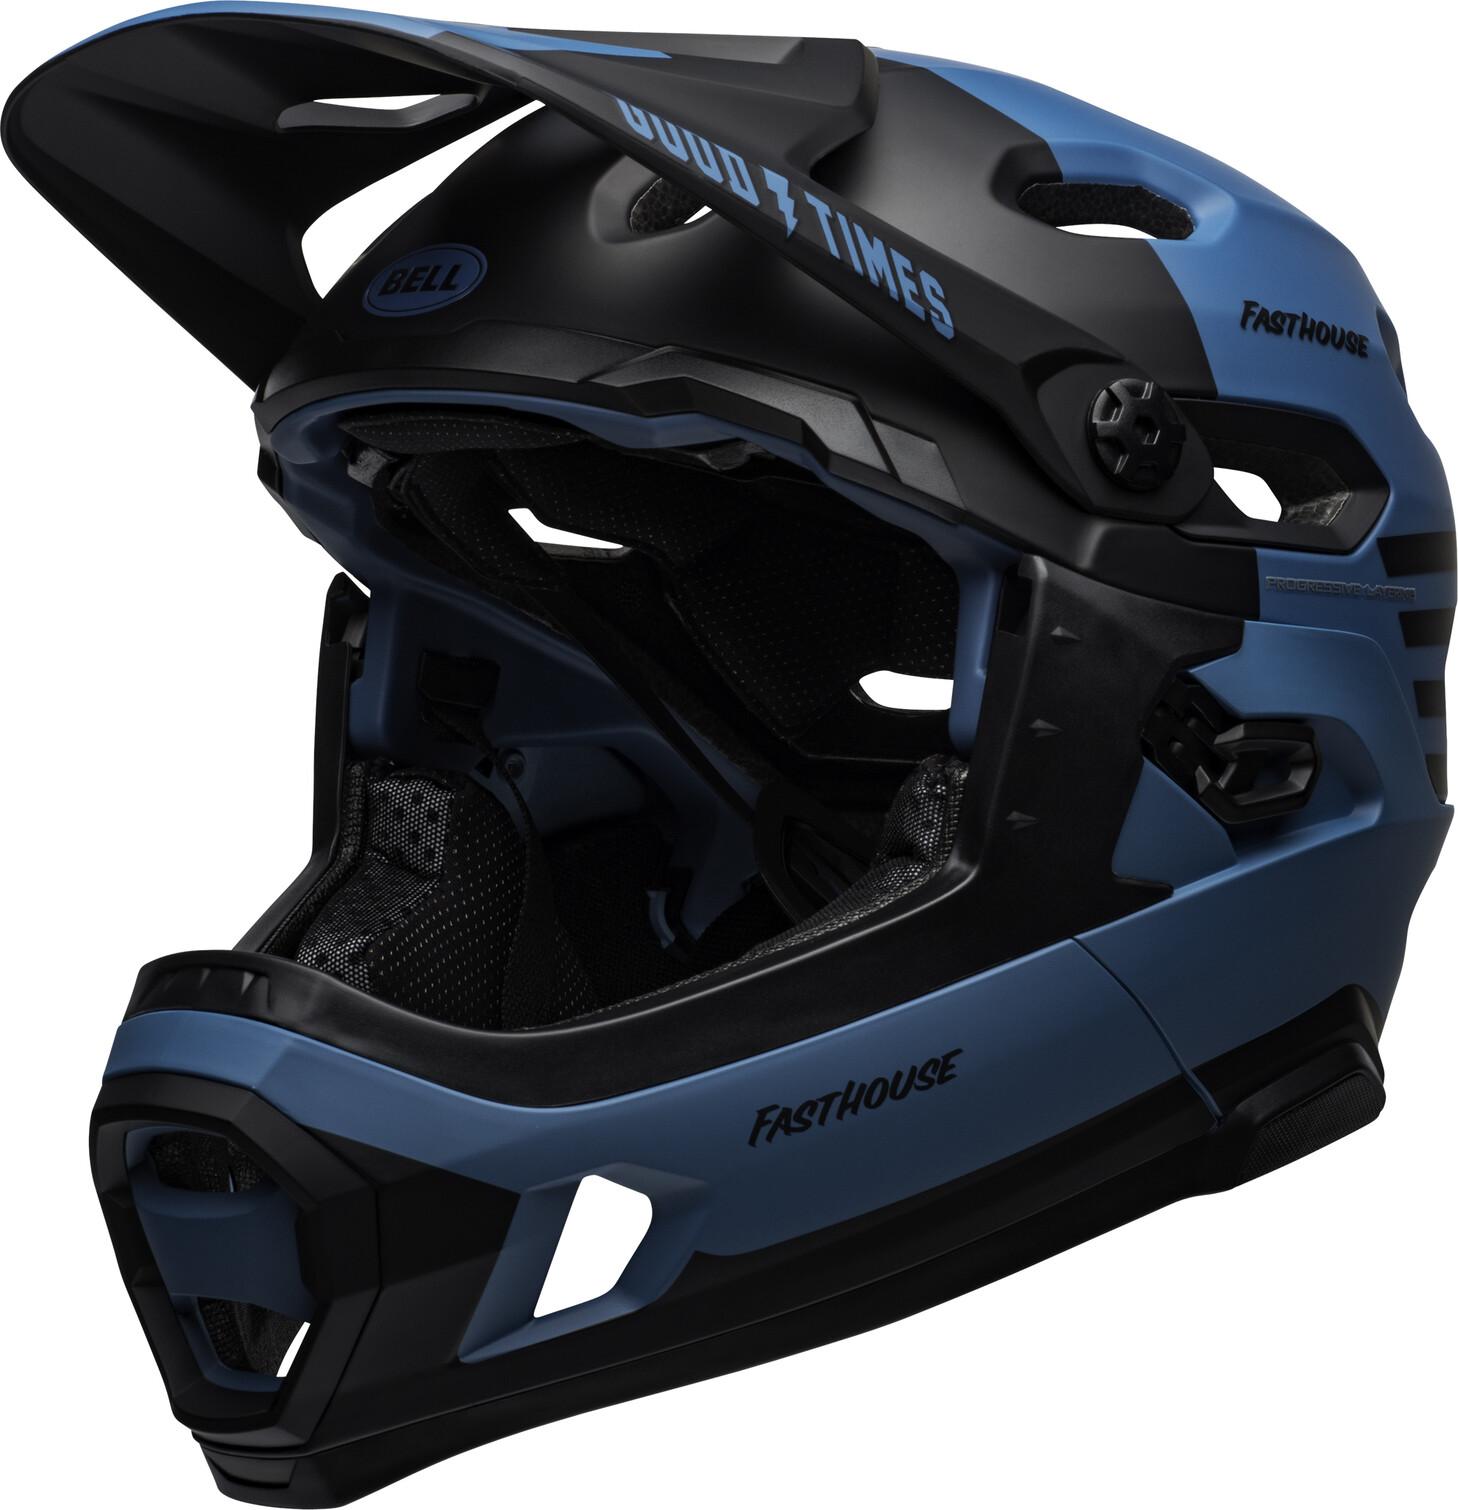 Bell Super DH MIPS Helmet fasthouse, matte blue/black (2019) | Hjelme